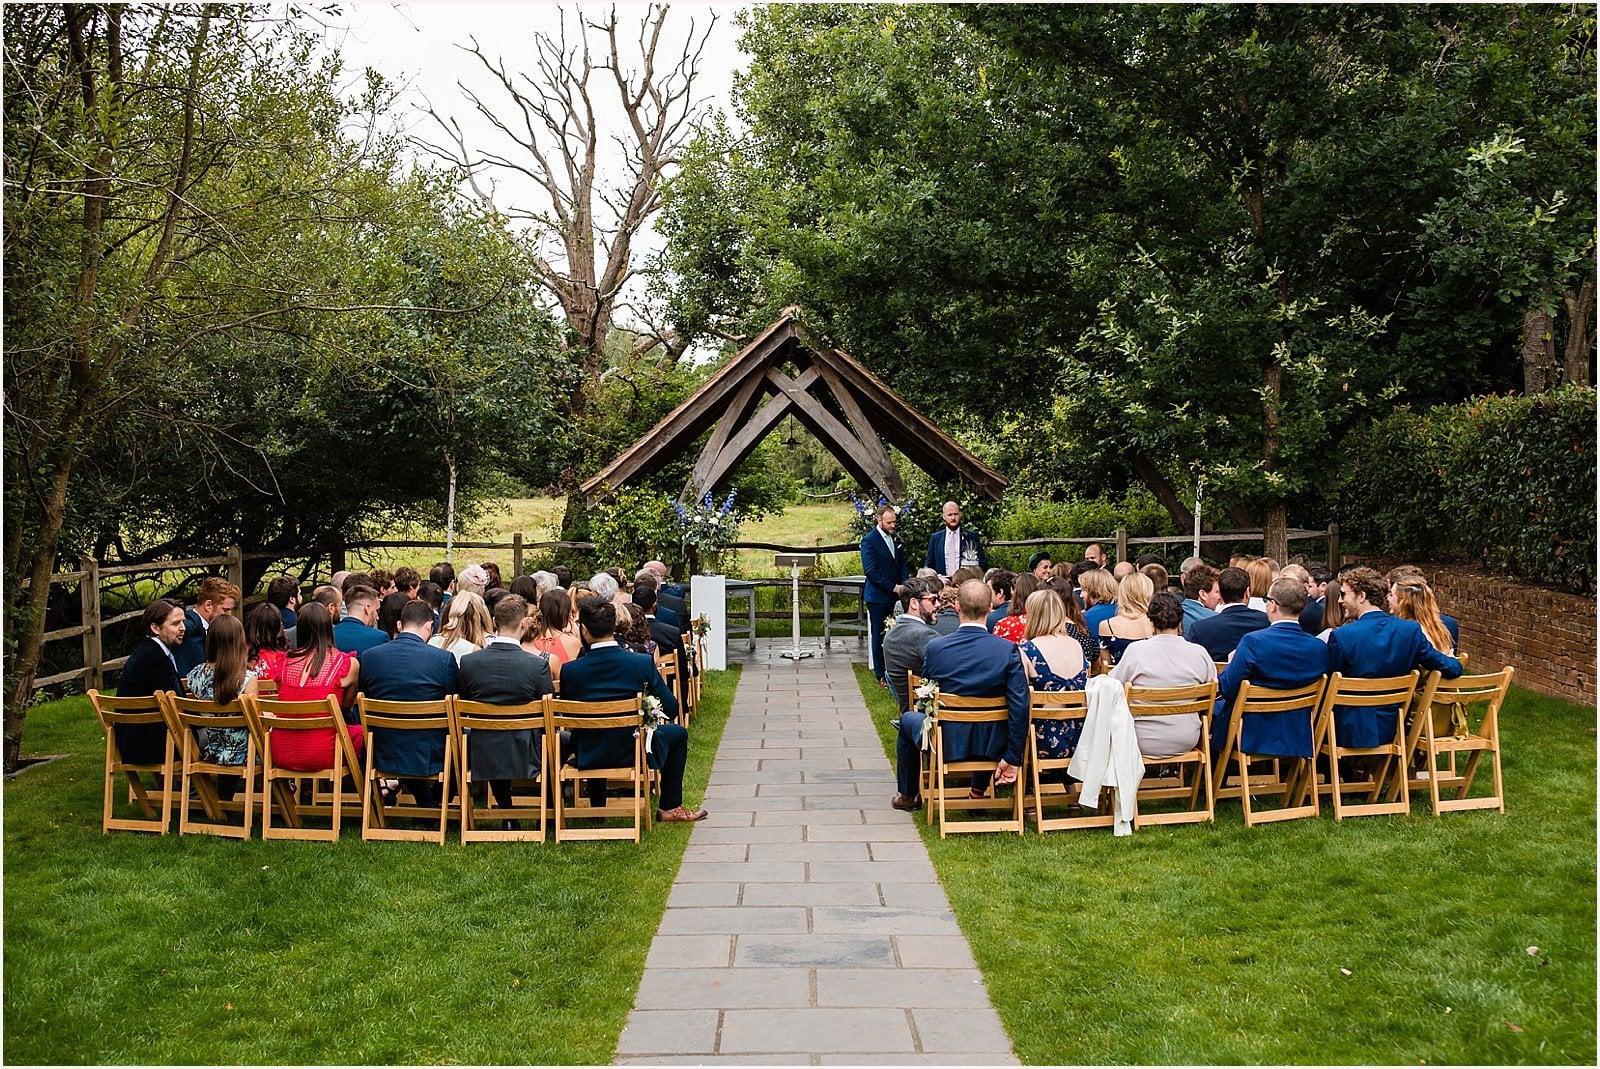 Millbridge Court Wedding - stunning summer wedding - wedding photography 26